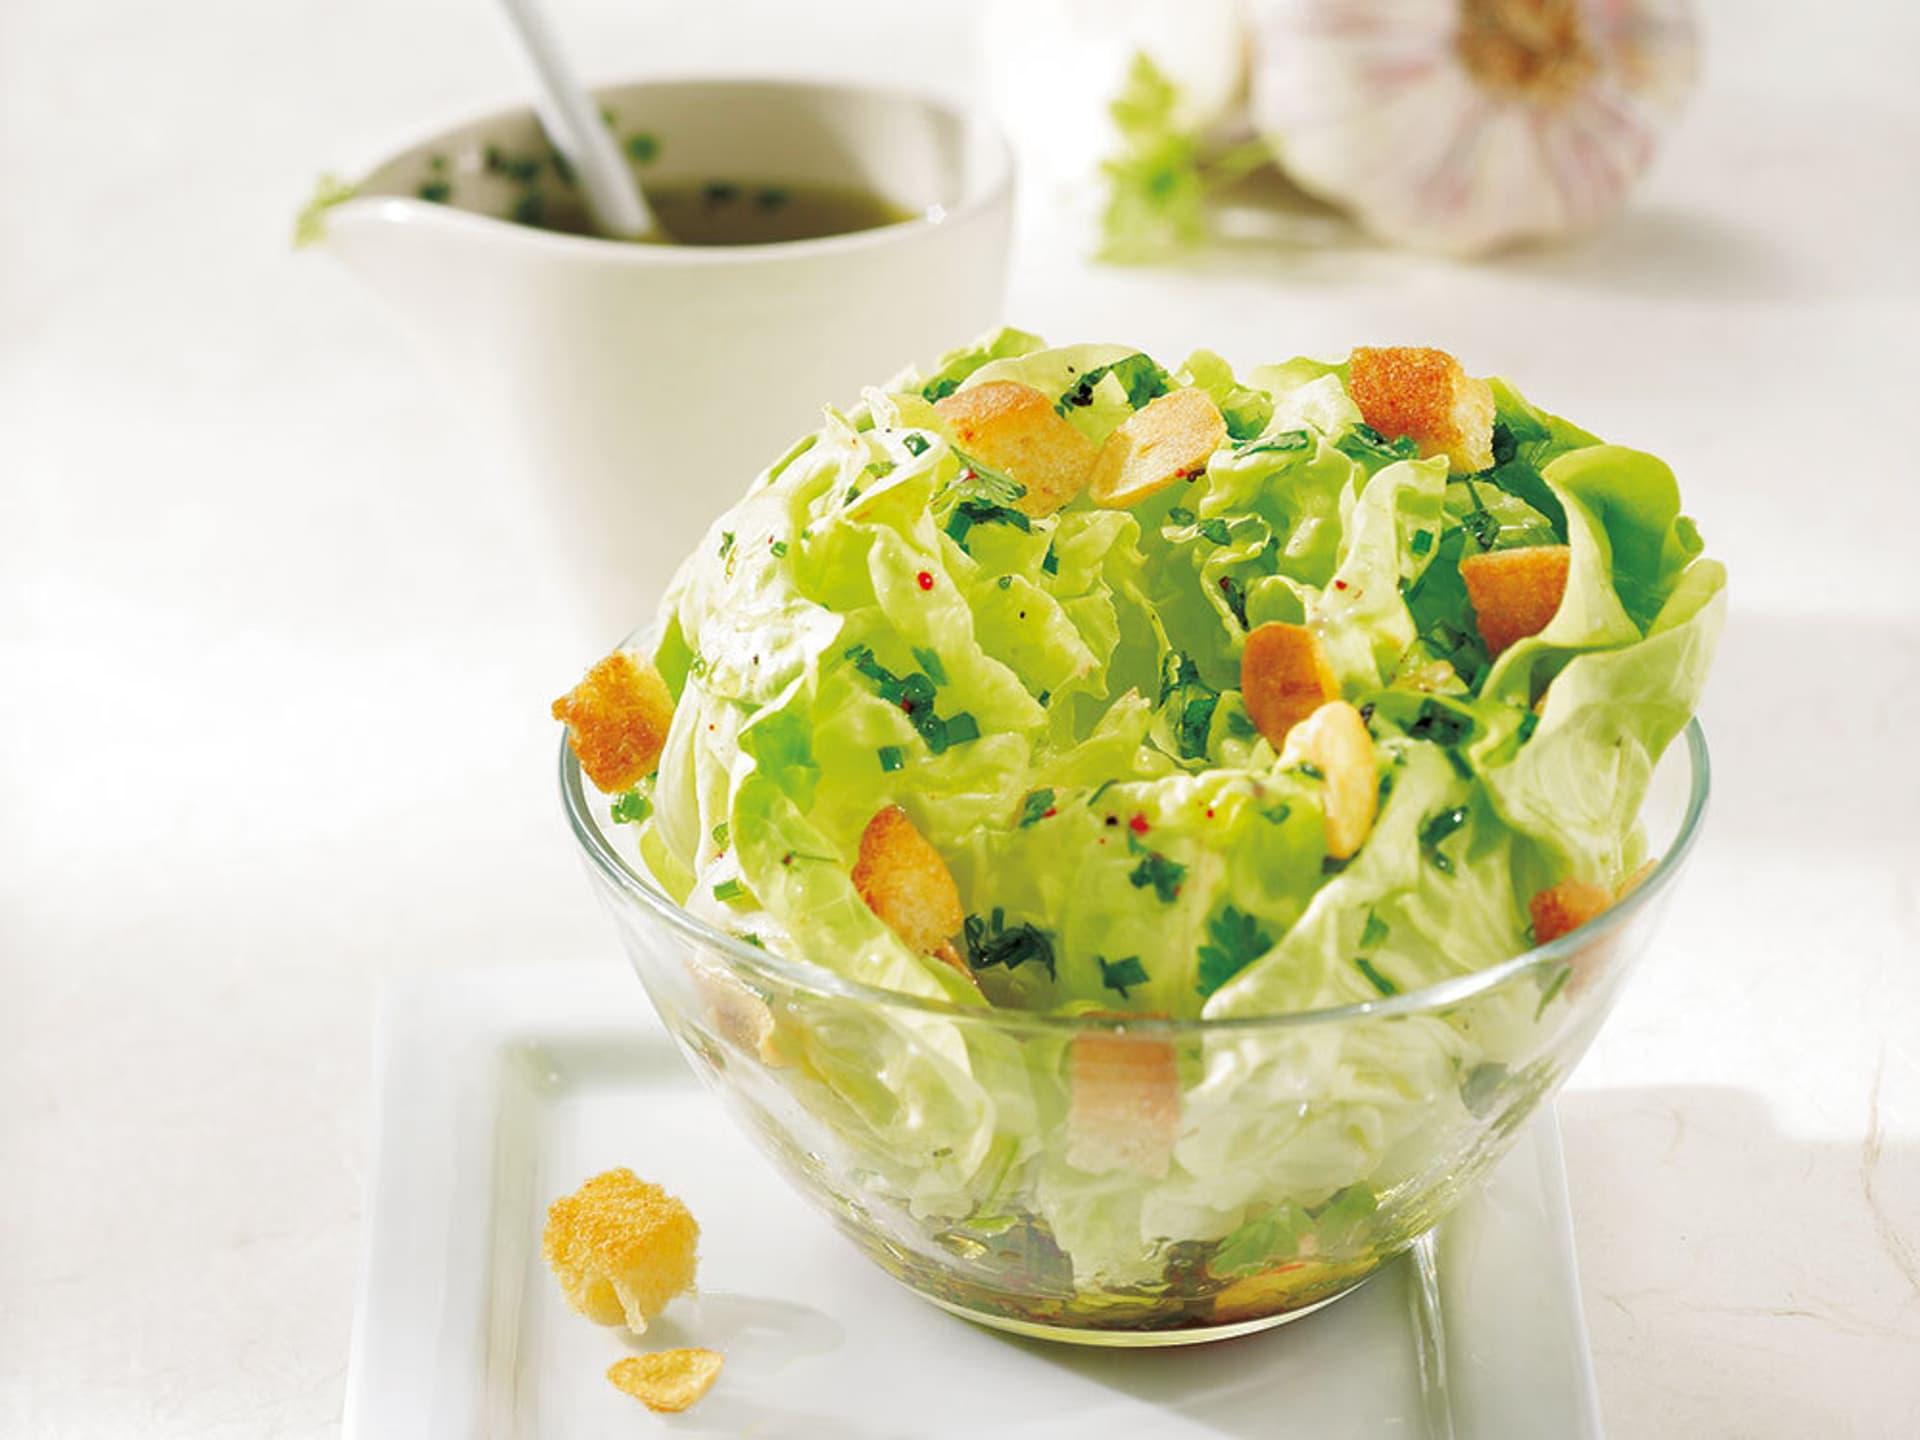 Kopfsalat im ganzen